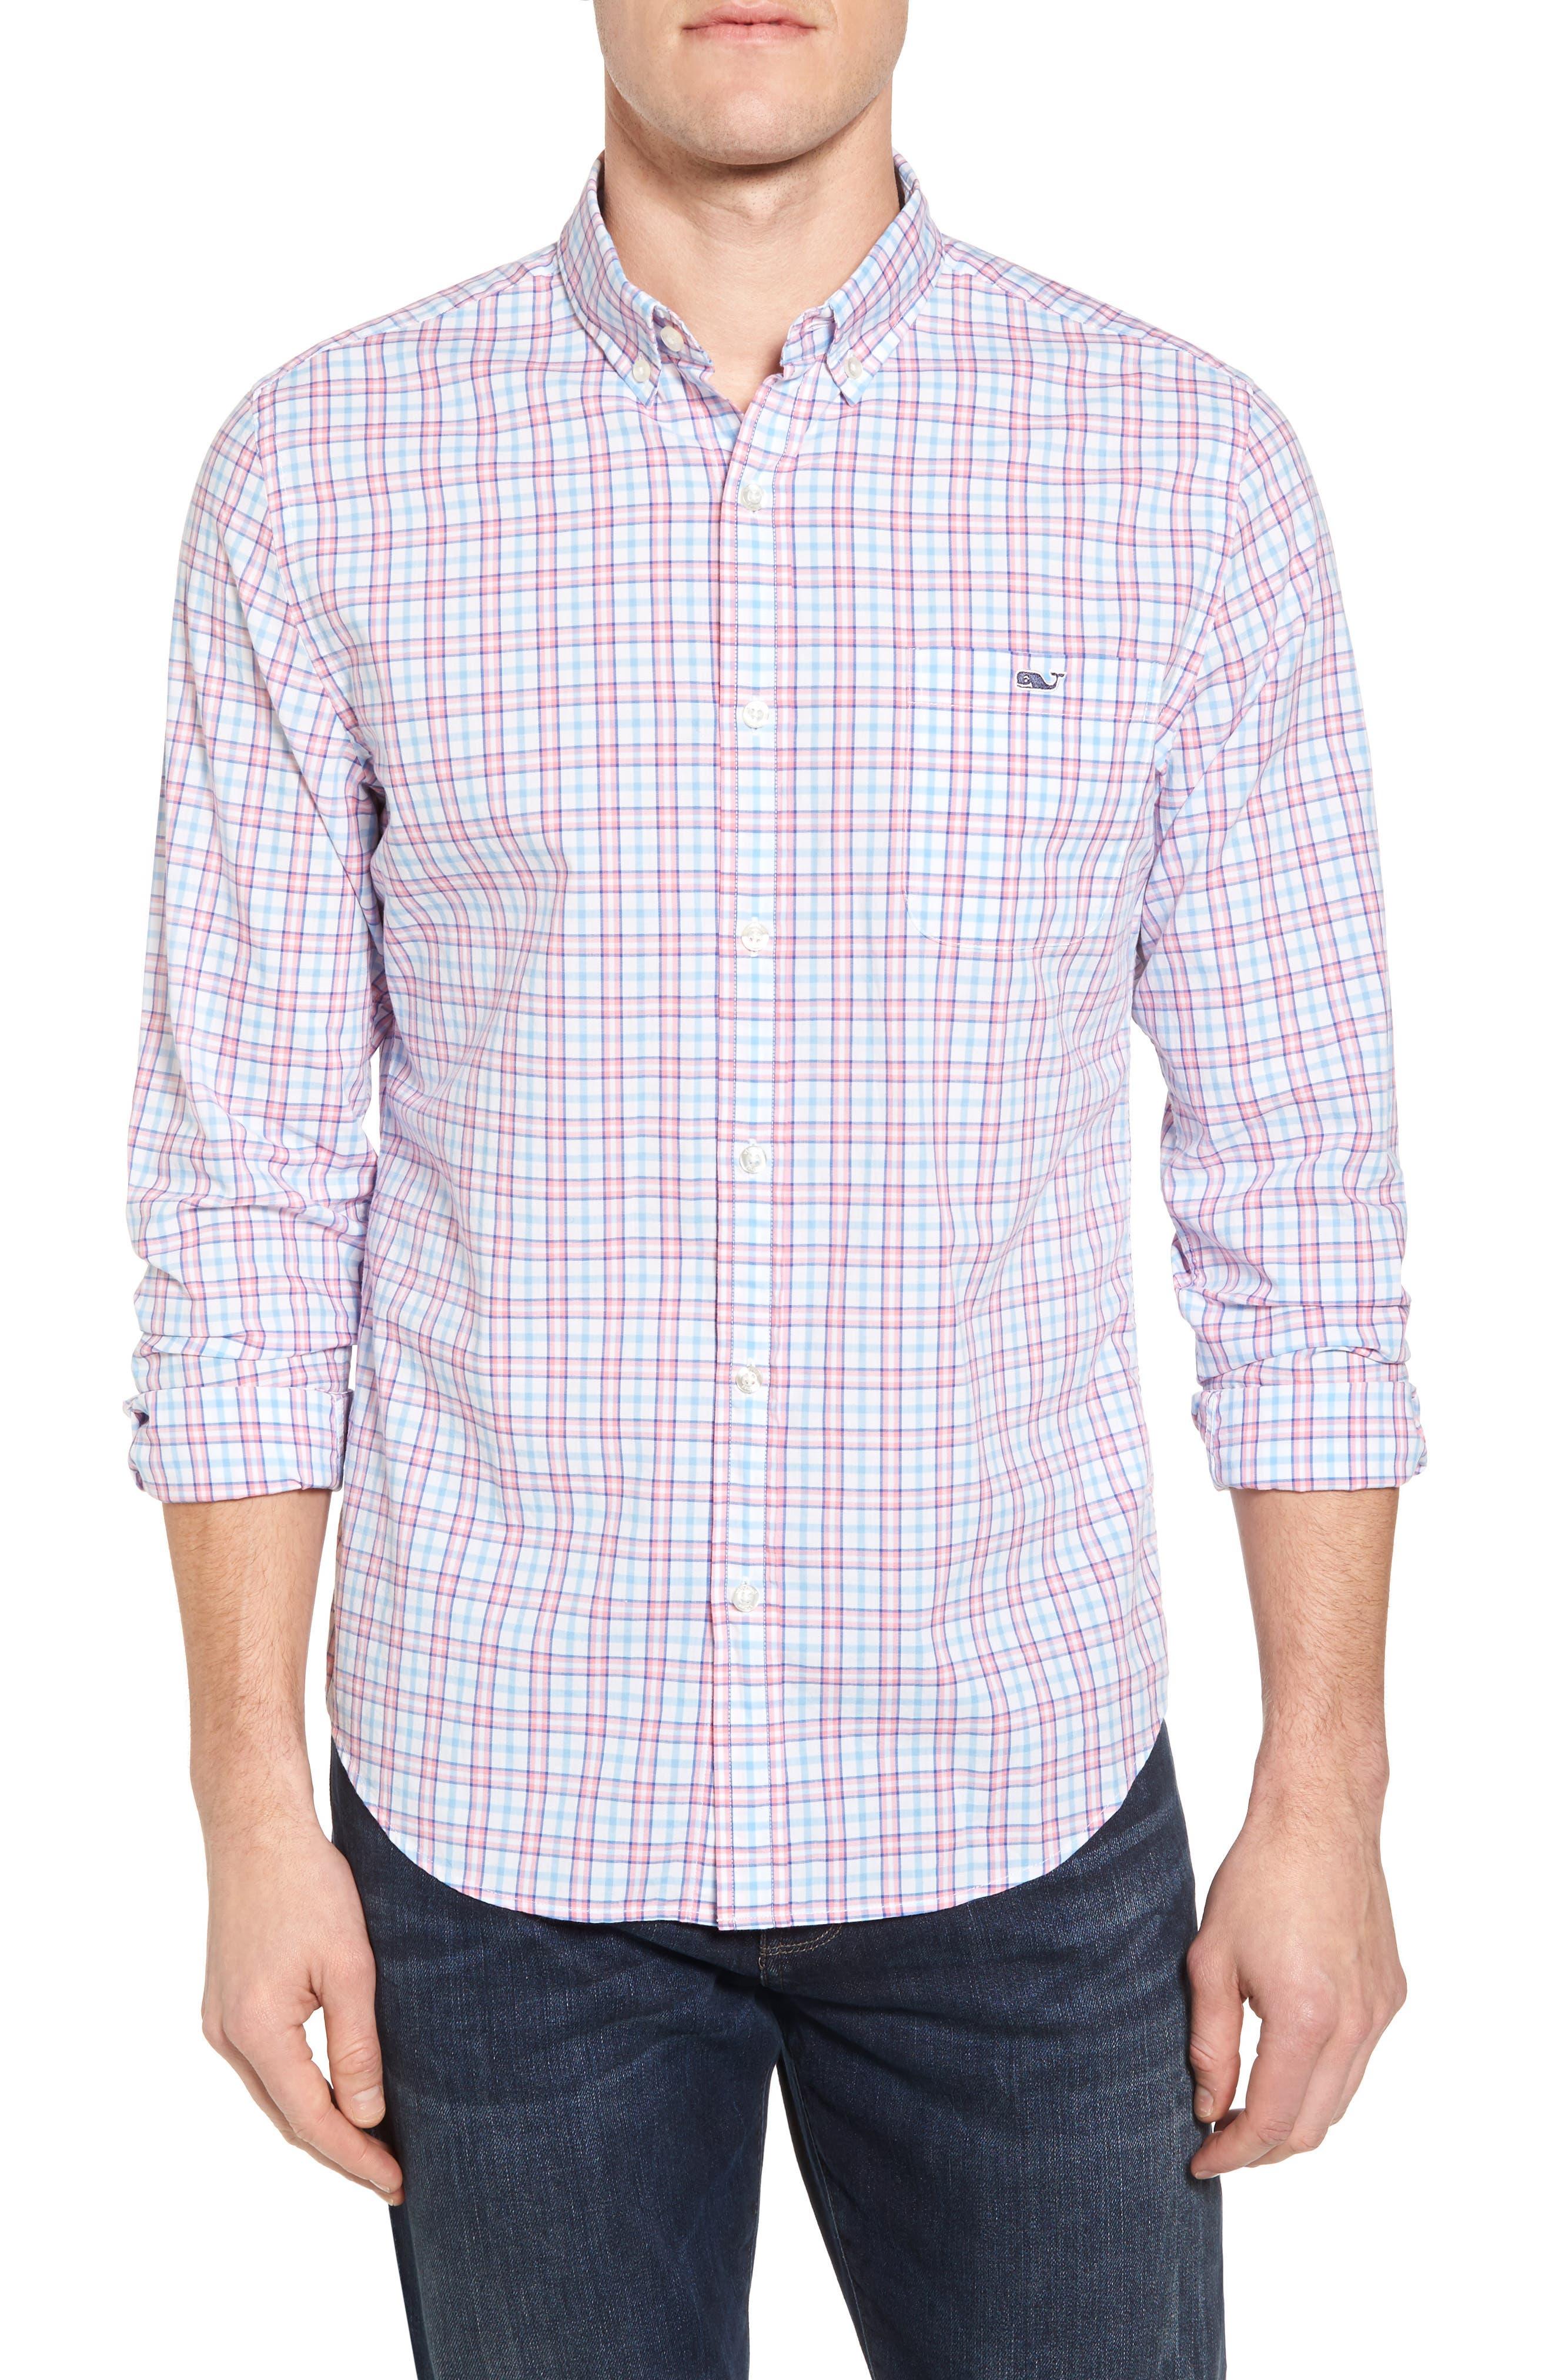 Kennard Tucker Slim Fit Plaid Sport Shirt,                         Main,                         color, Bahama Breeze